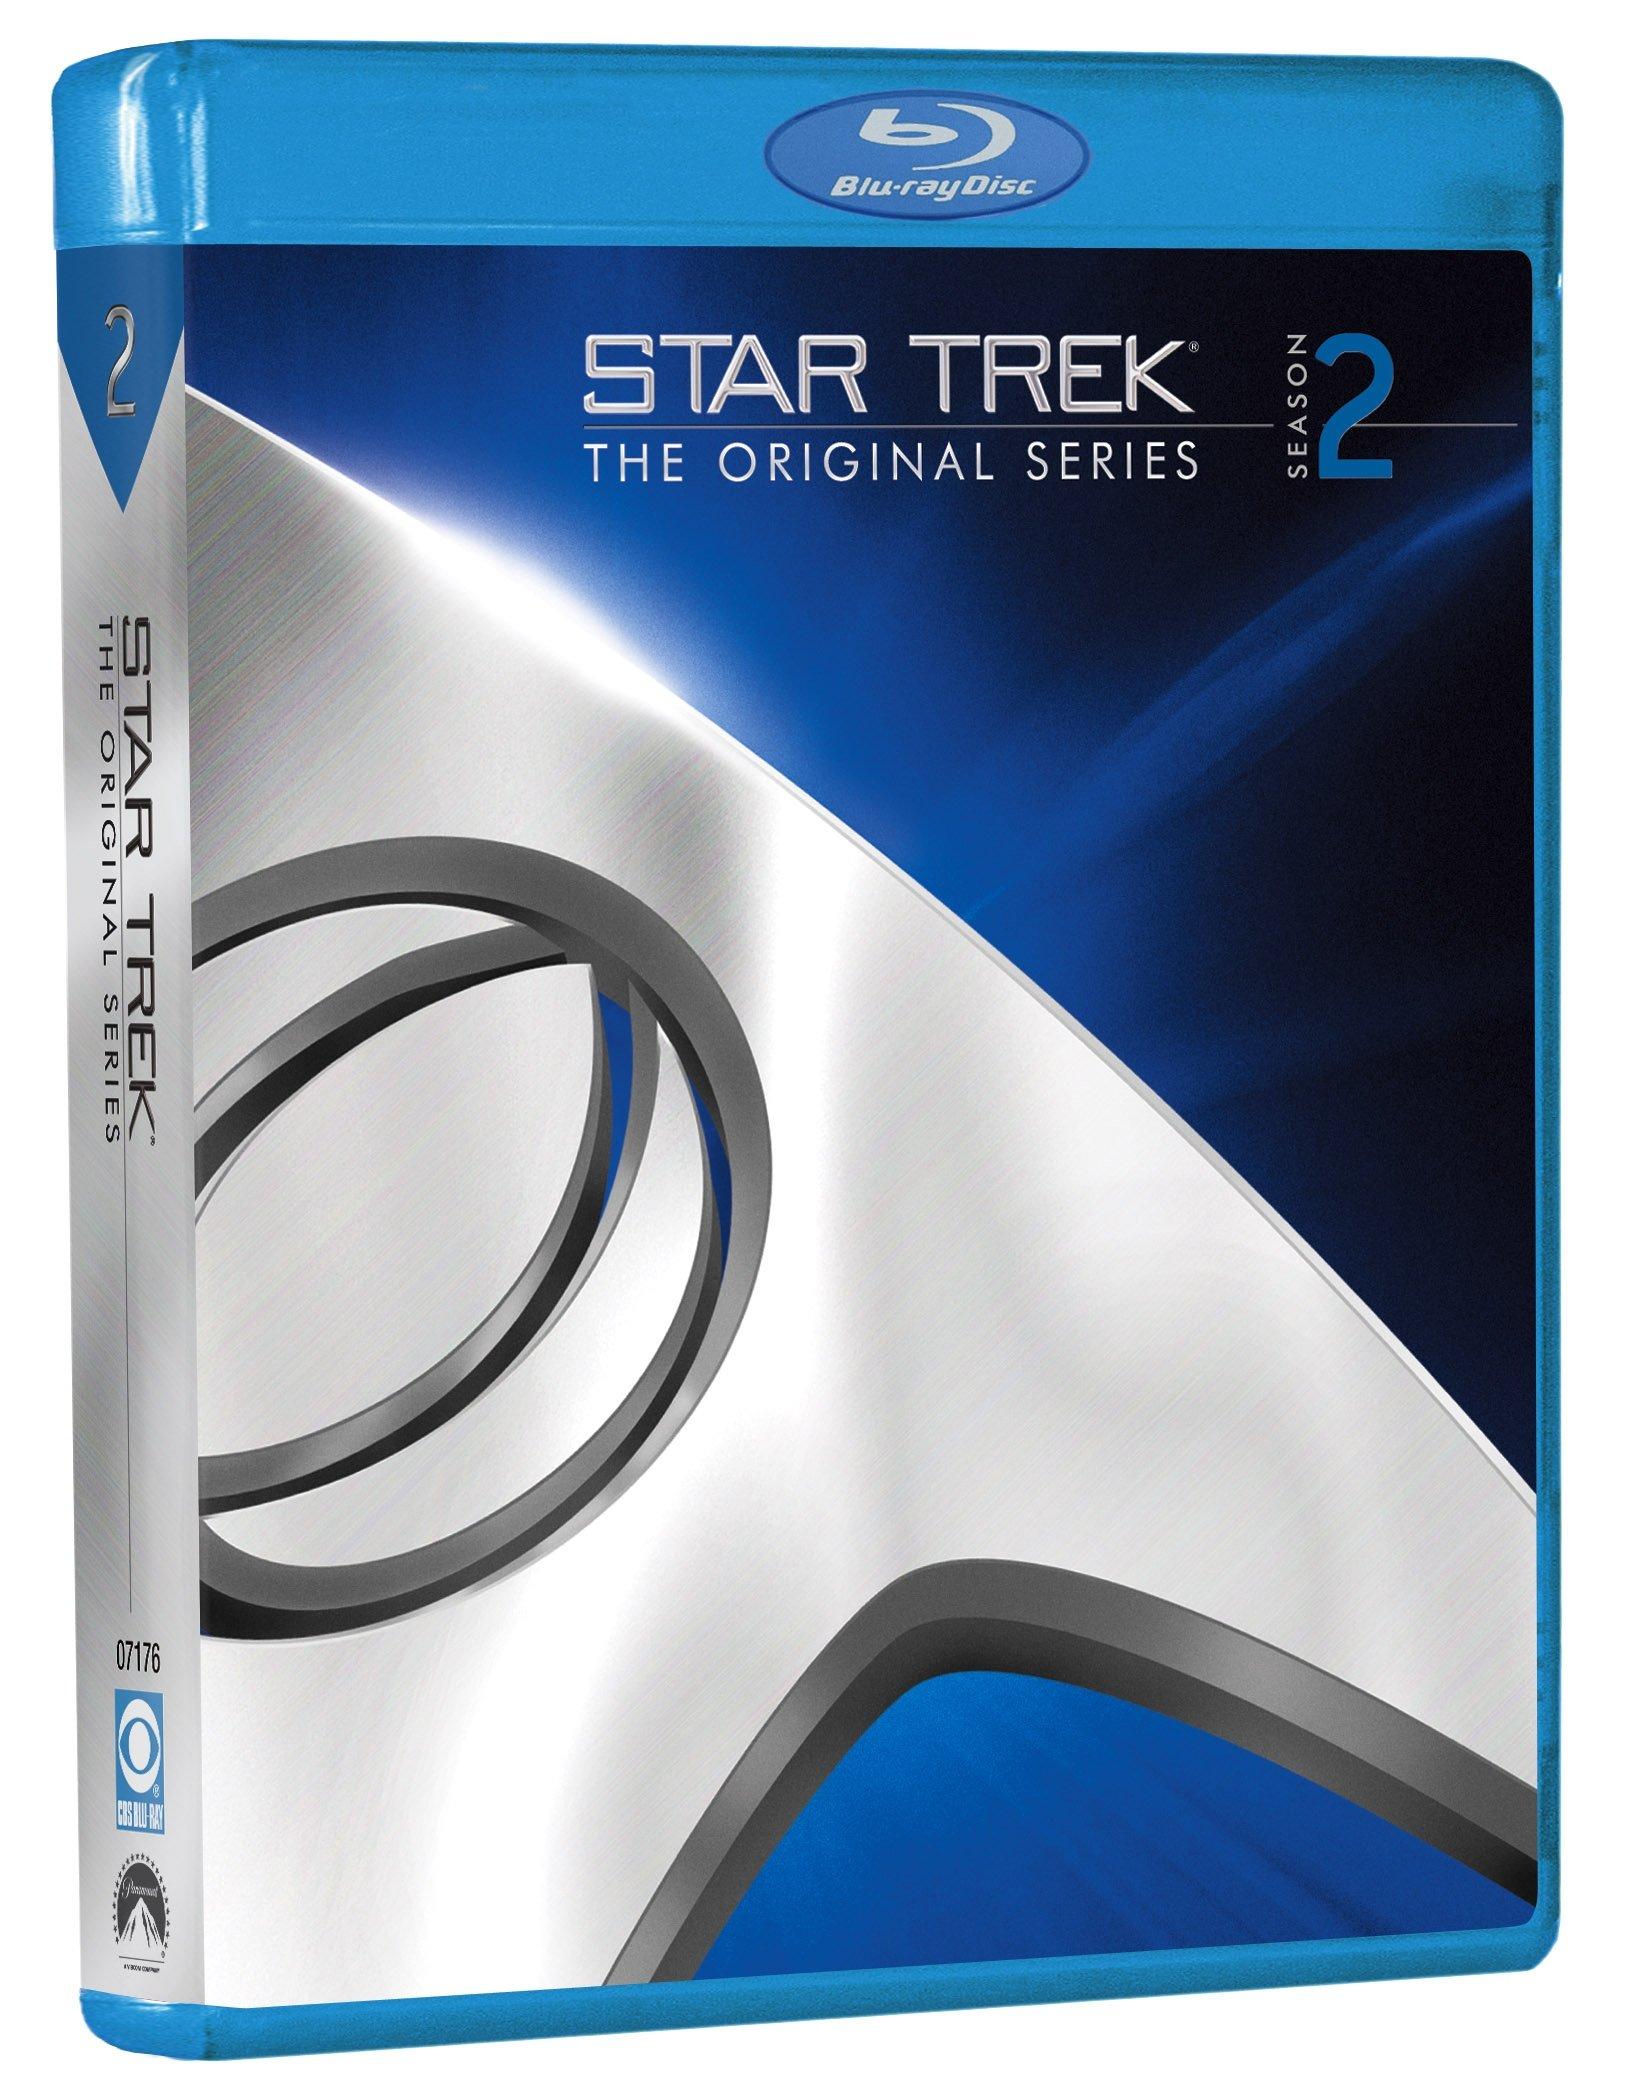 Blu-ray : Star Trek: The Original Series: Season 2 (, Dubbed, Dolby, AC-3, Digital Theater System)